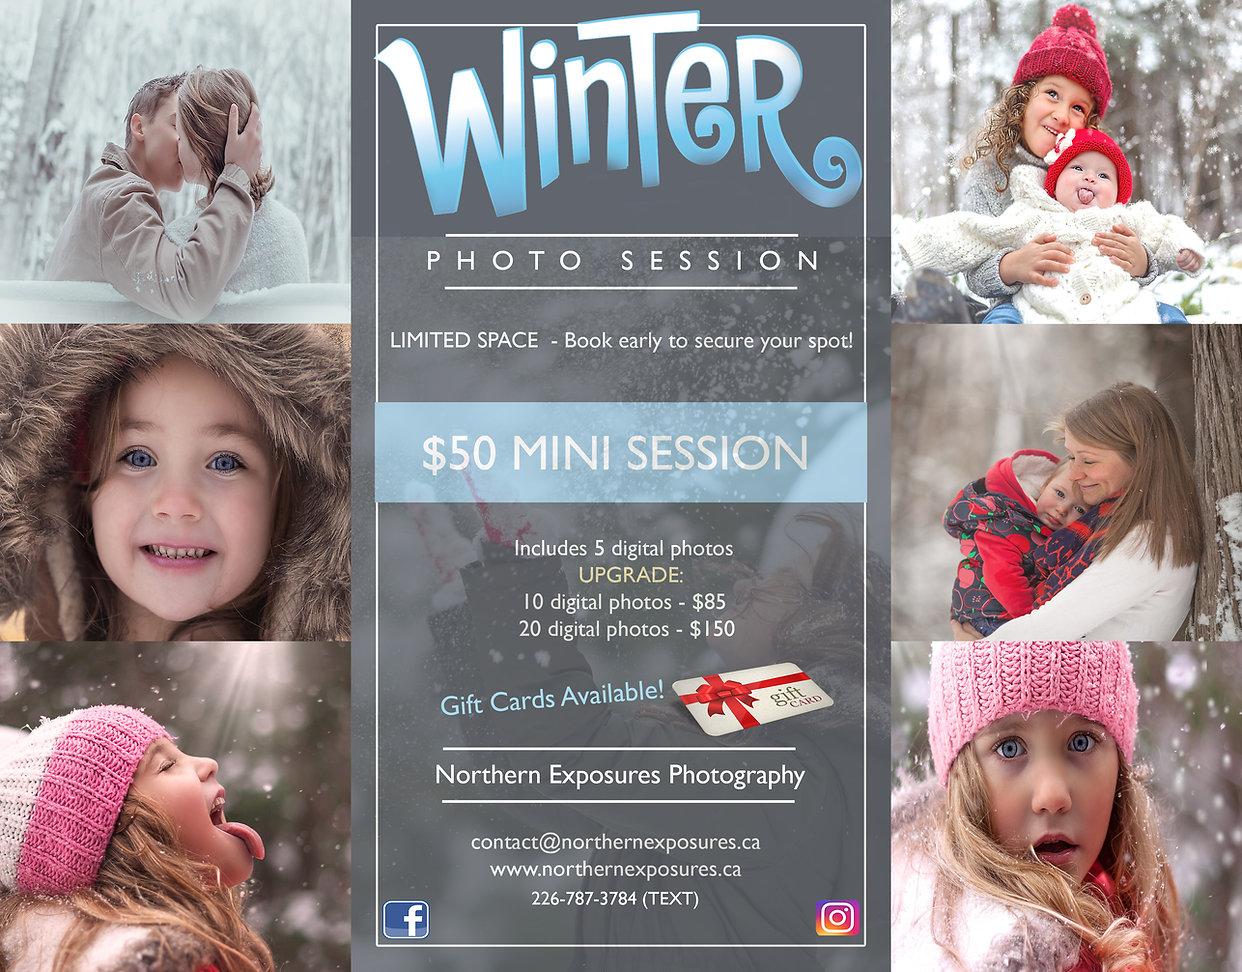 winter photo session.jpg